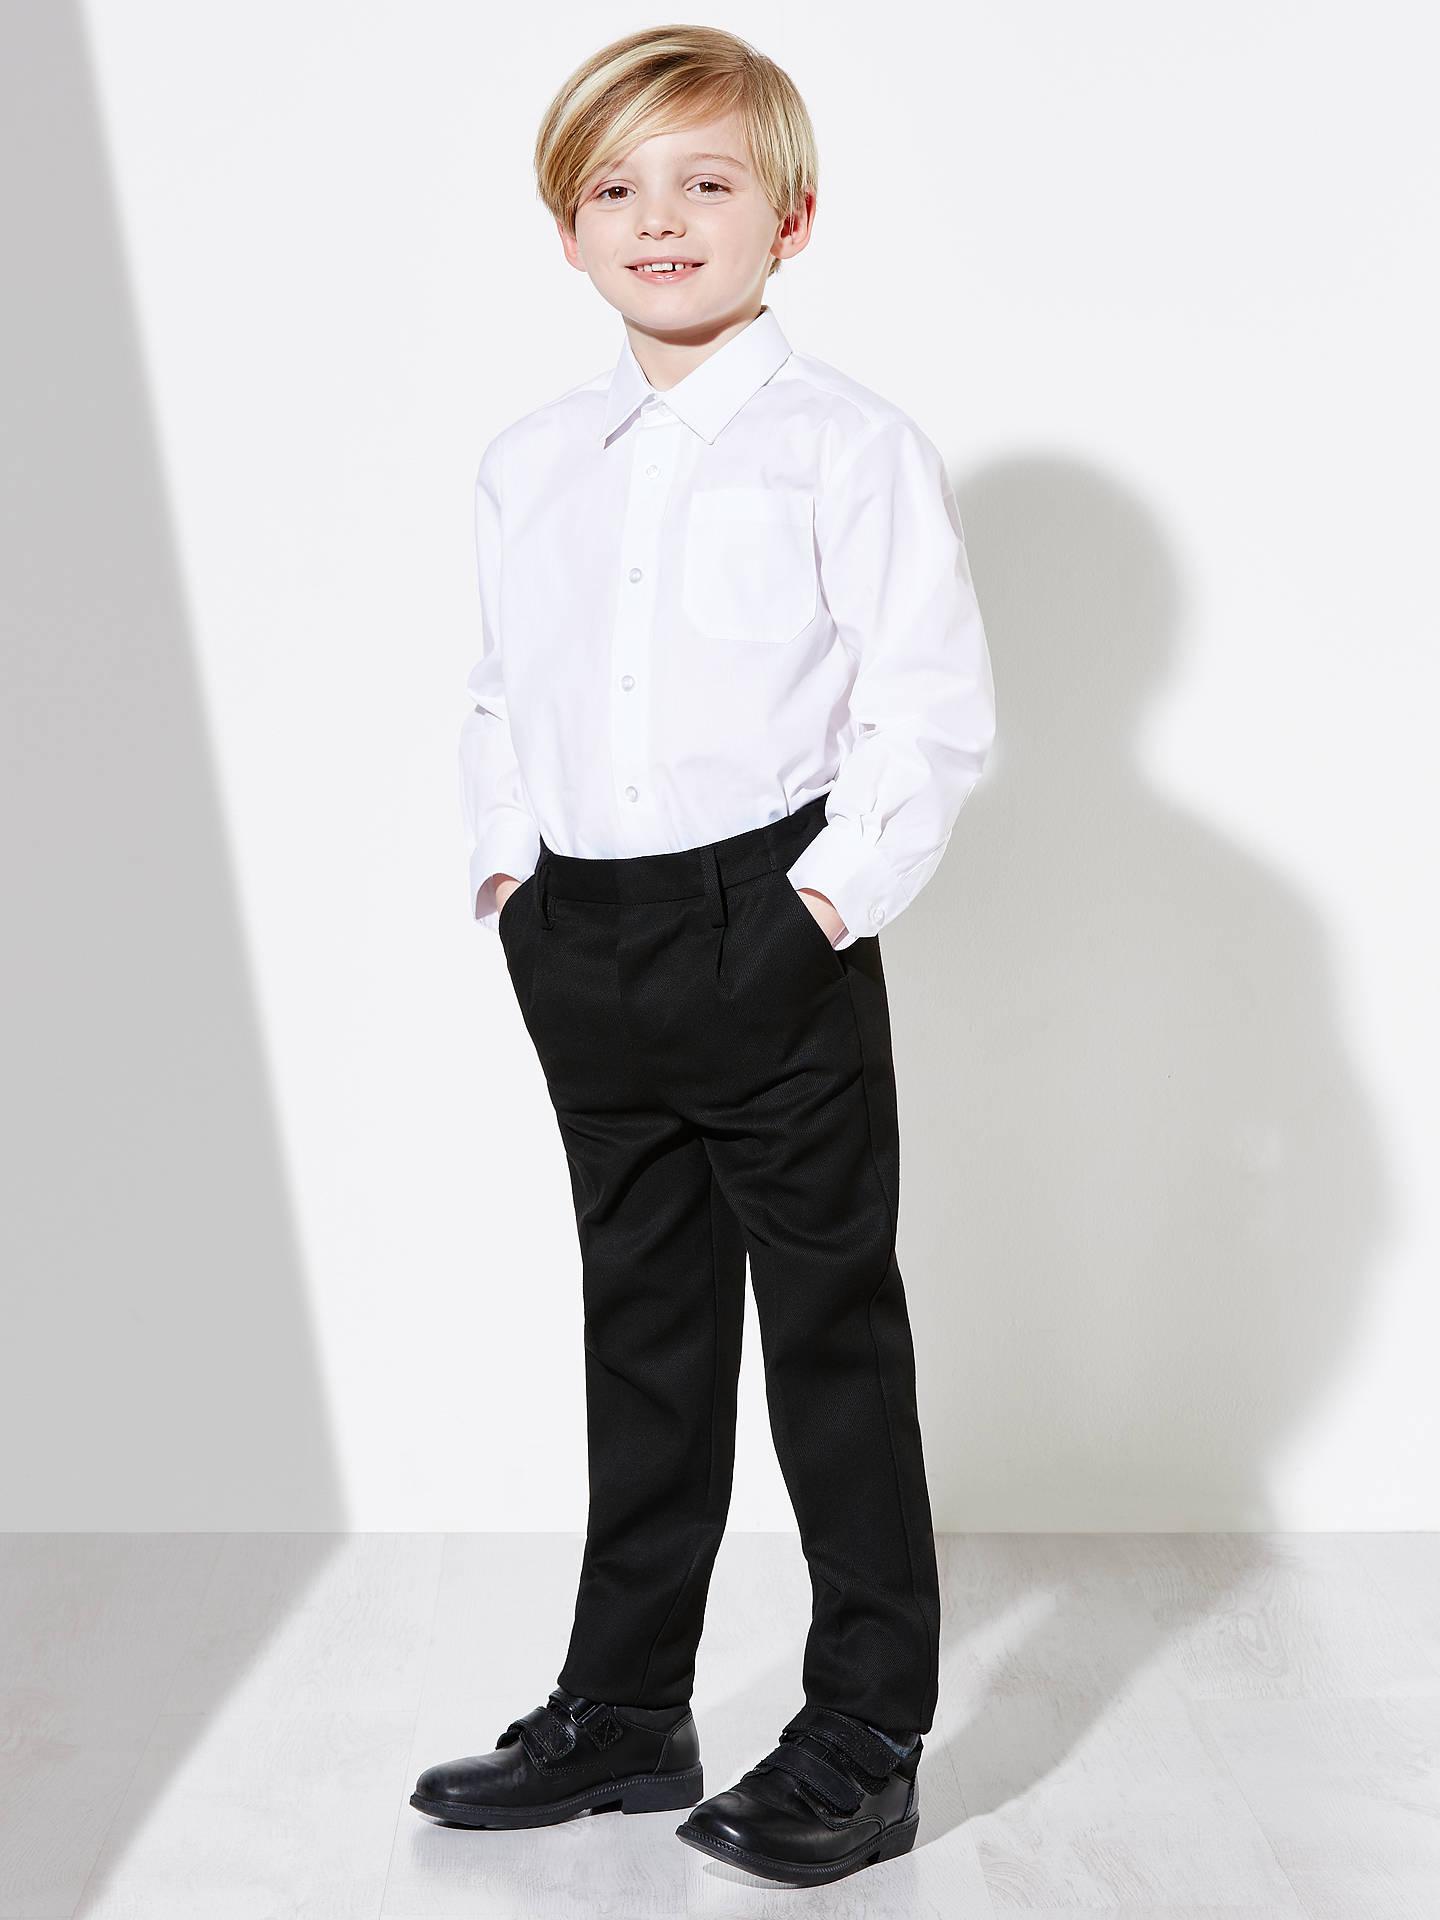 John Lewis Boys/' Long Sleeve School Shirt Teflon Shield Pro+ Pack of 2 White